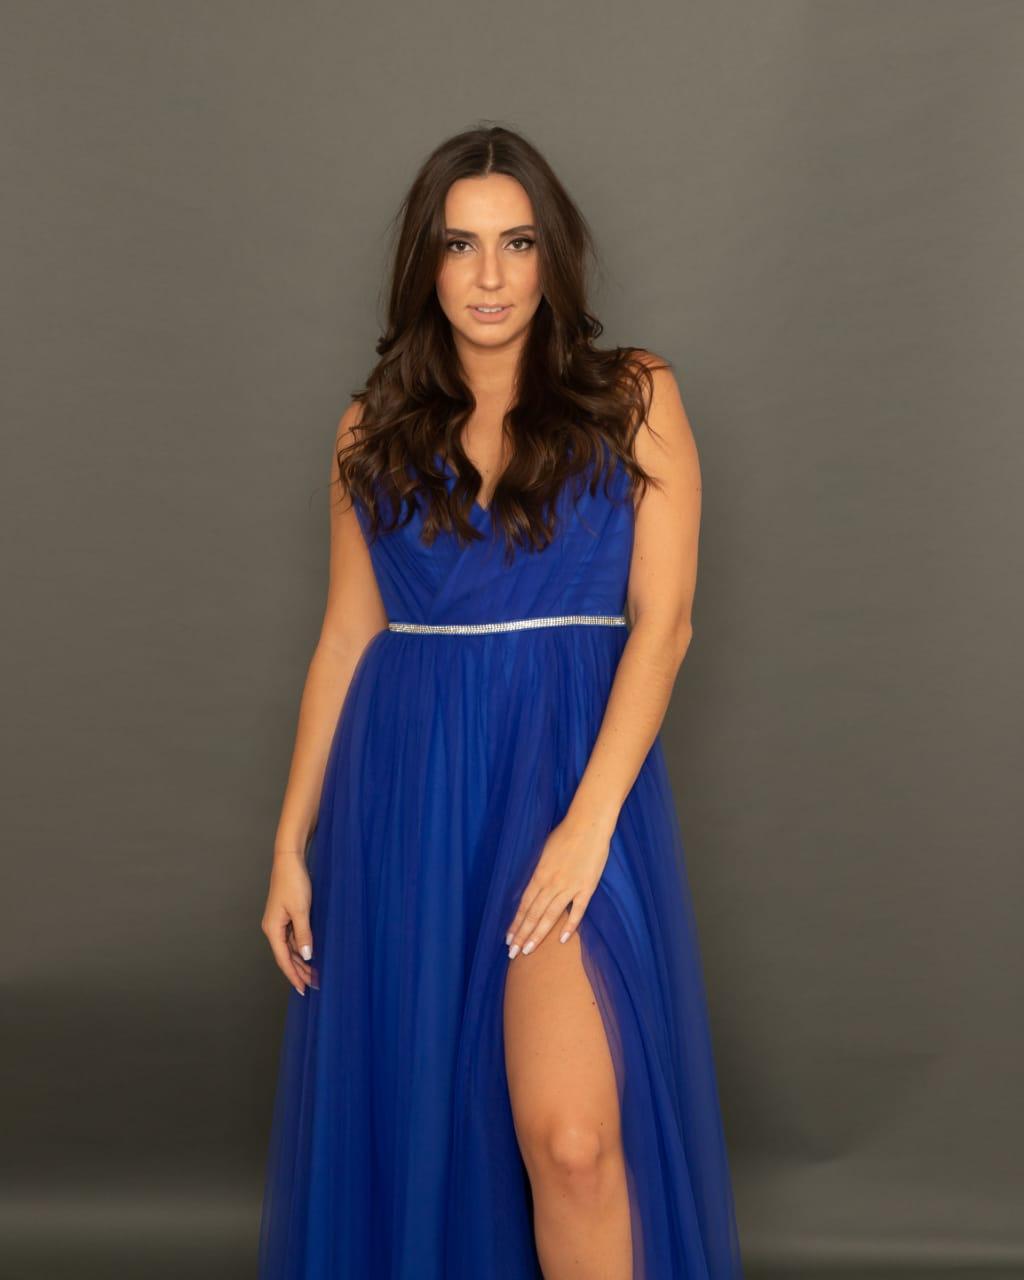 Miss Brasil Unificado Duda Zorovich aguarda concurso internacional